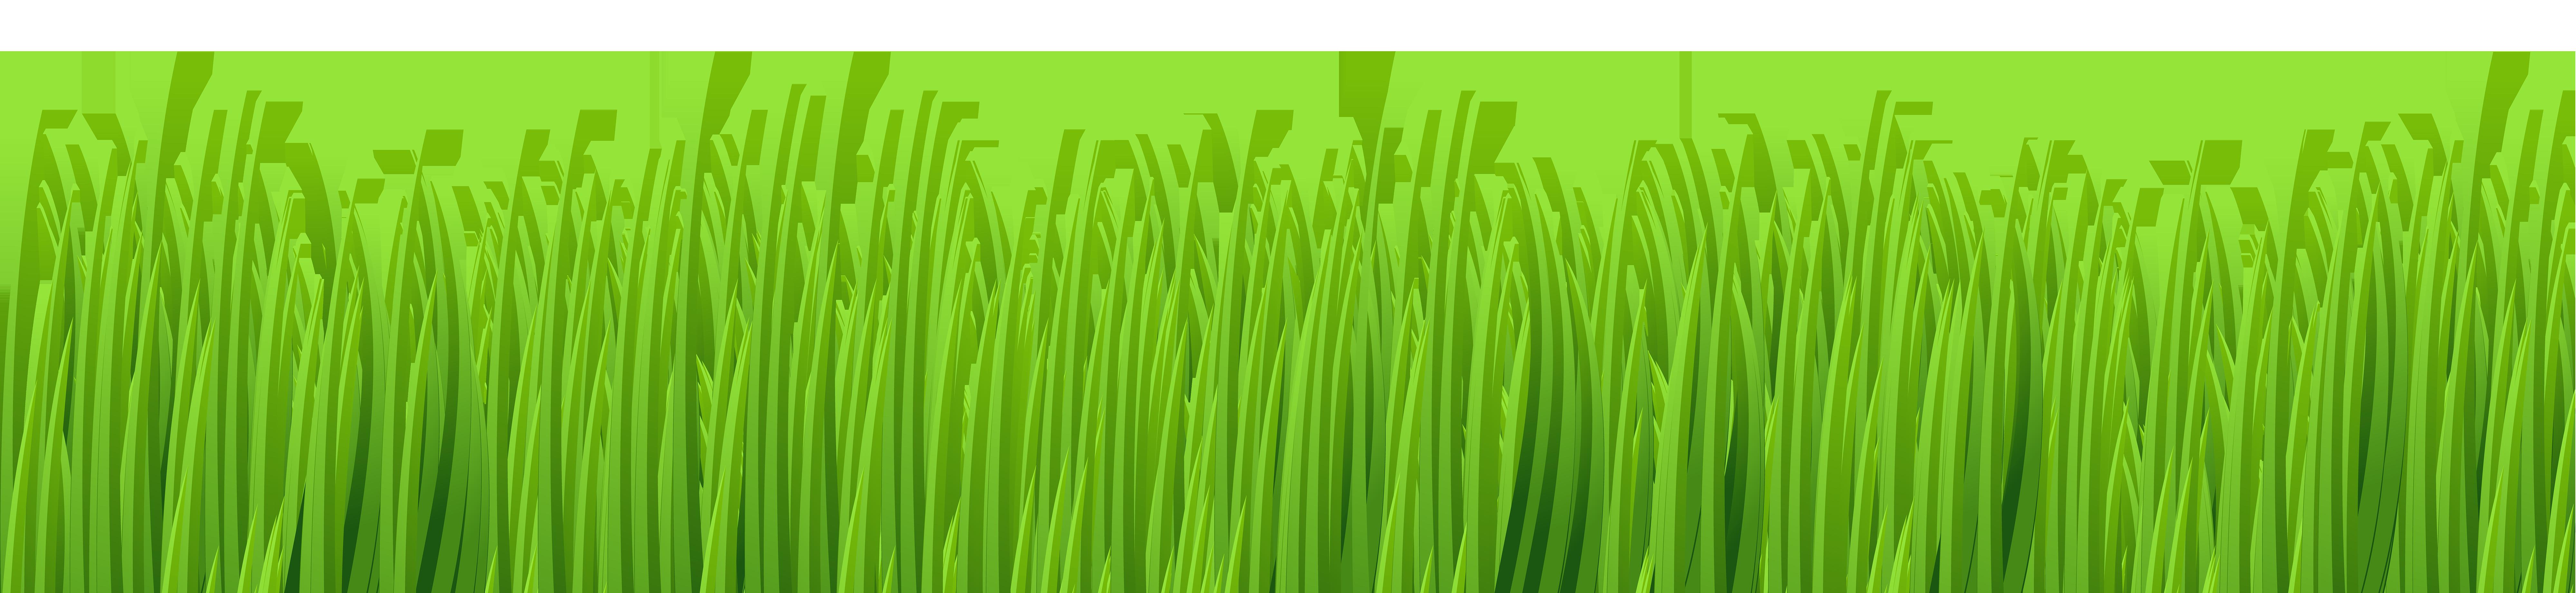 Ground transparent clip art. Clipart grass spring